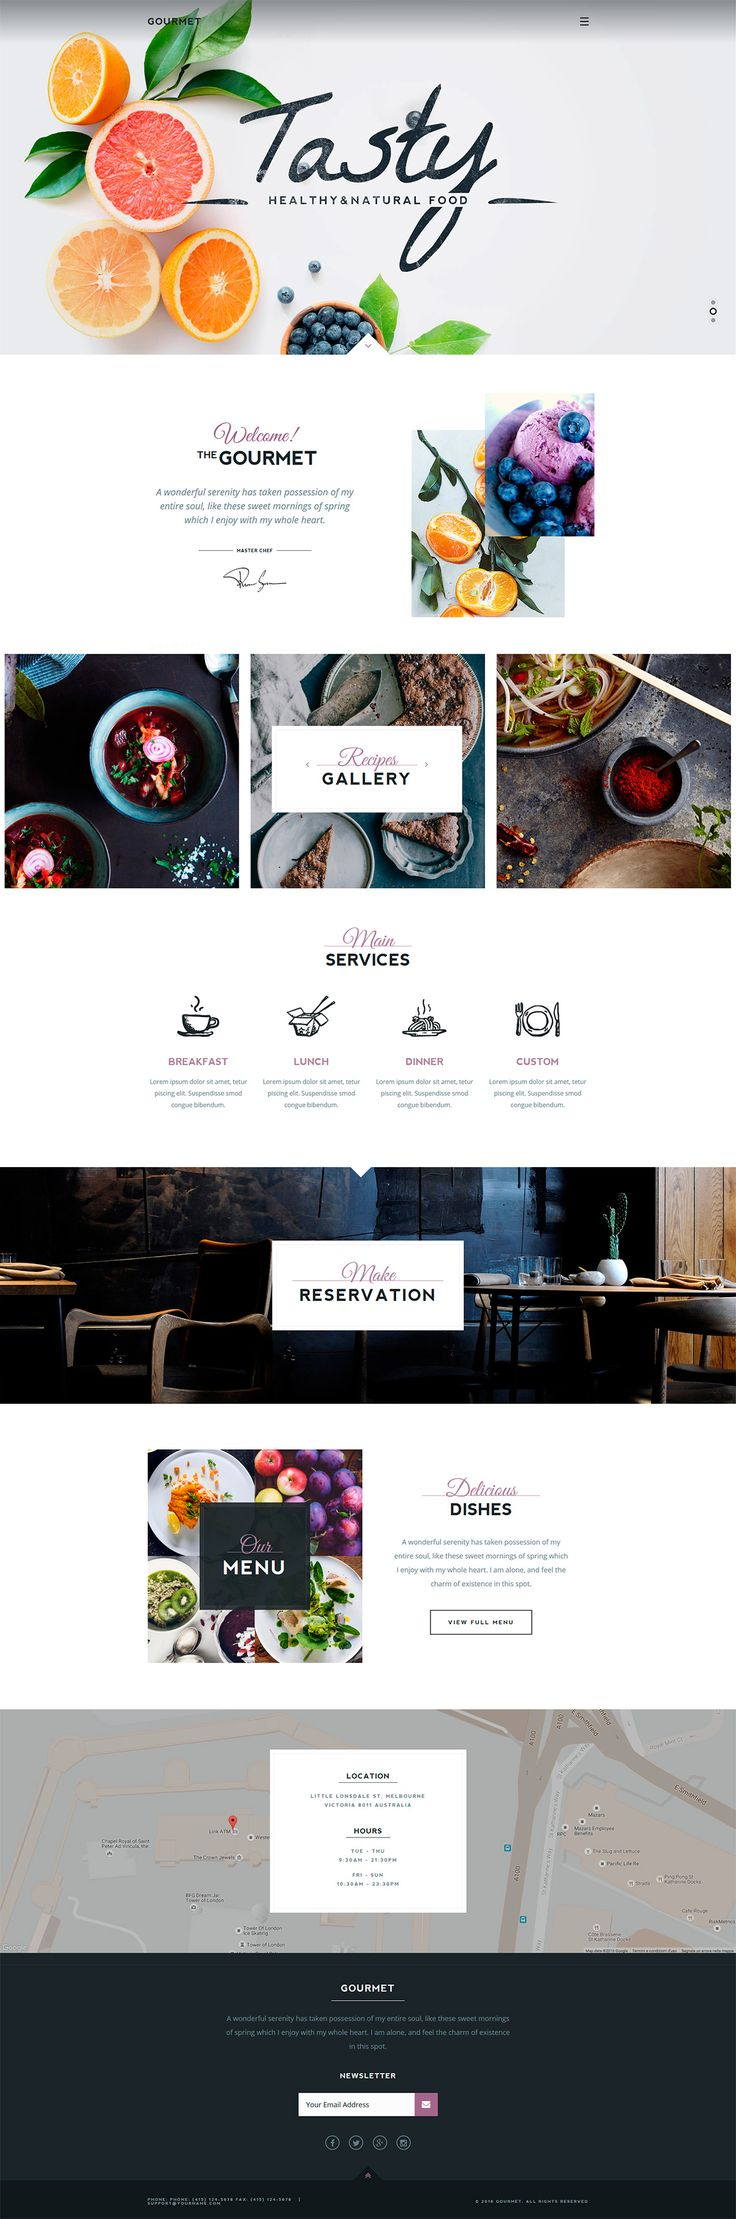 Gourmet - Restaurant & Cafe WordPress Theme #website #theme #wp #wordpress #theme #web #restaurant #cafe #food